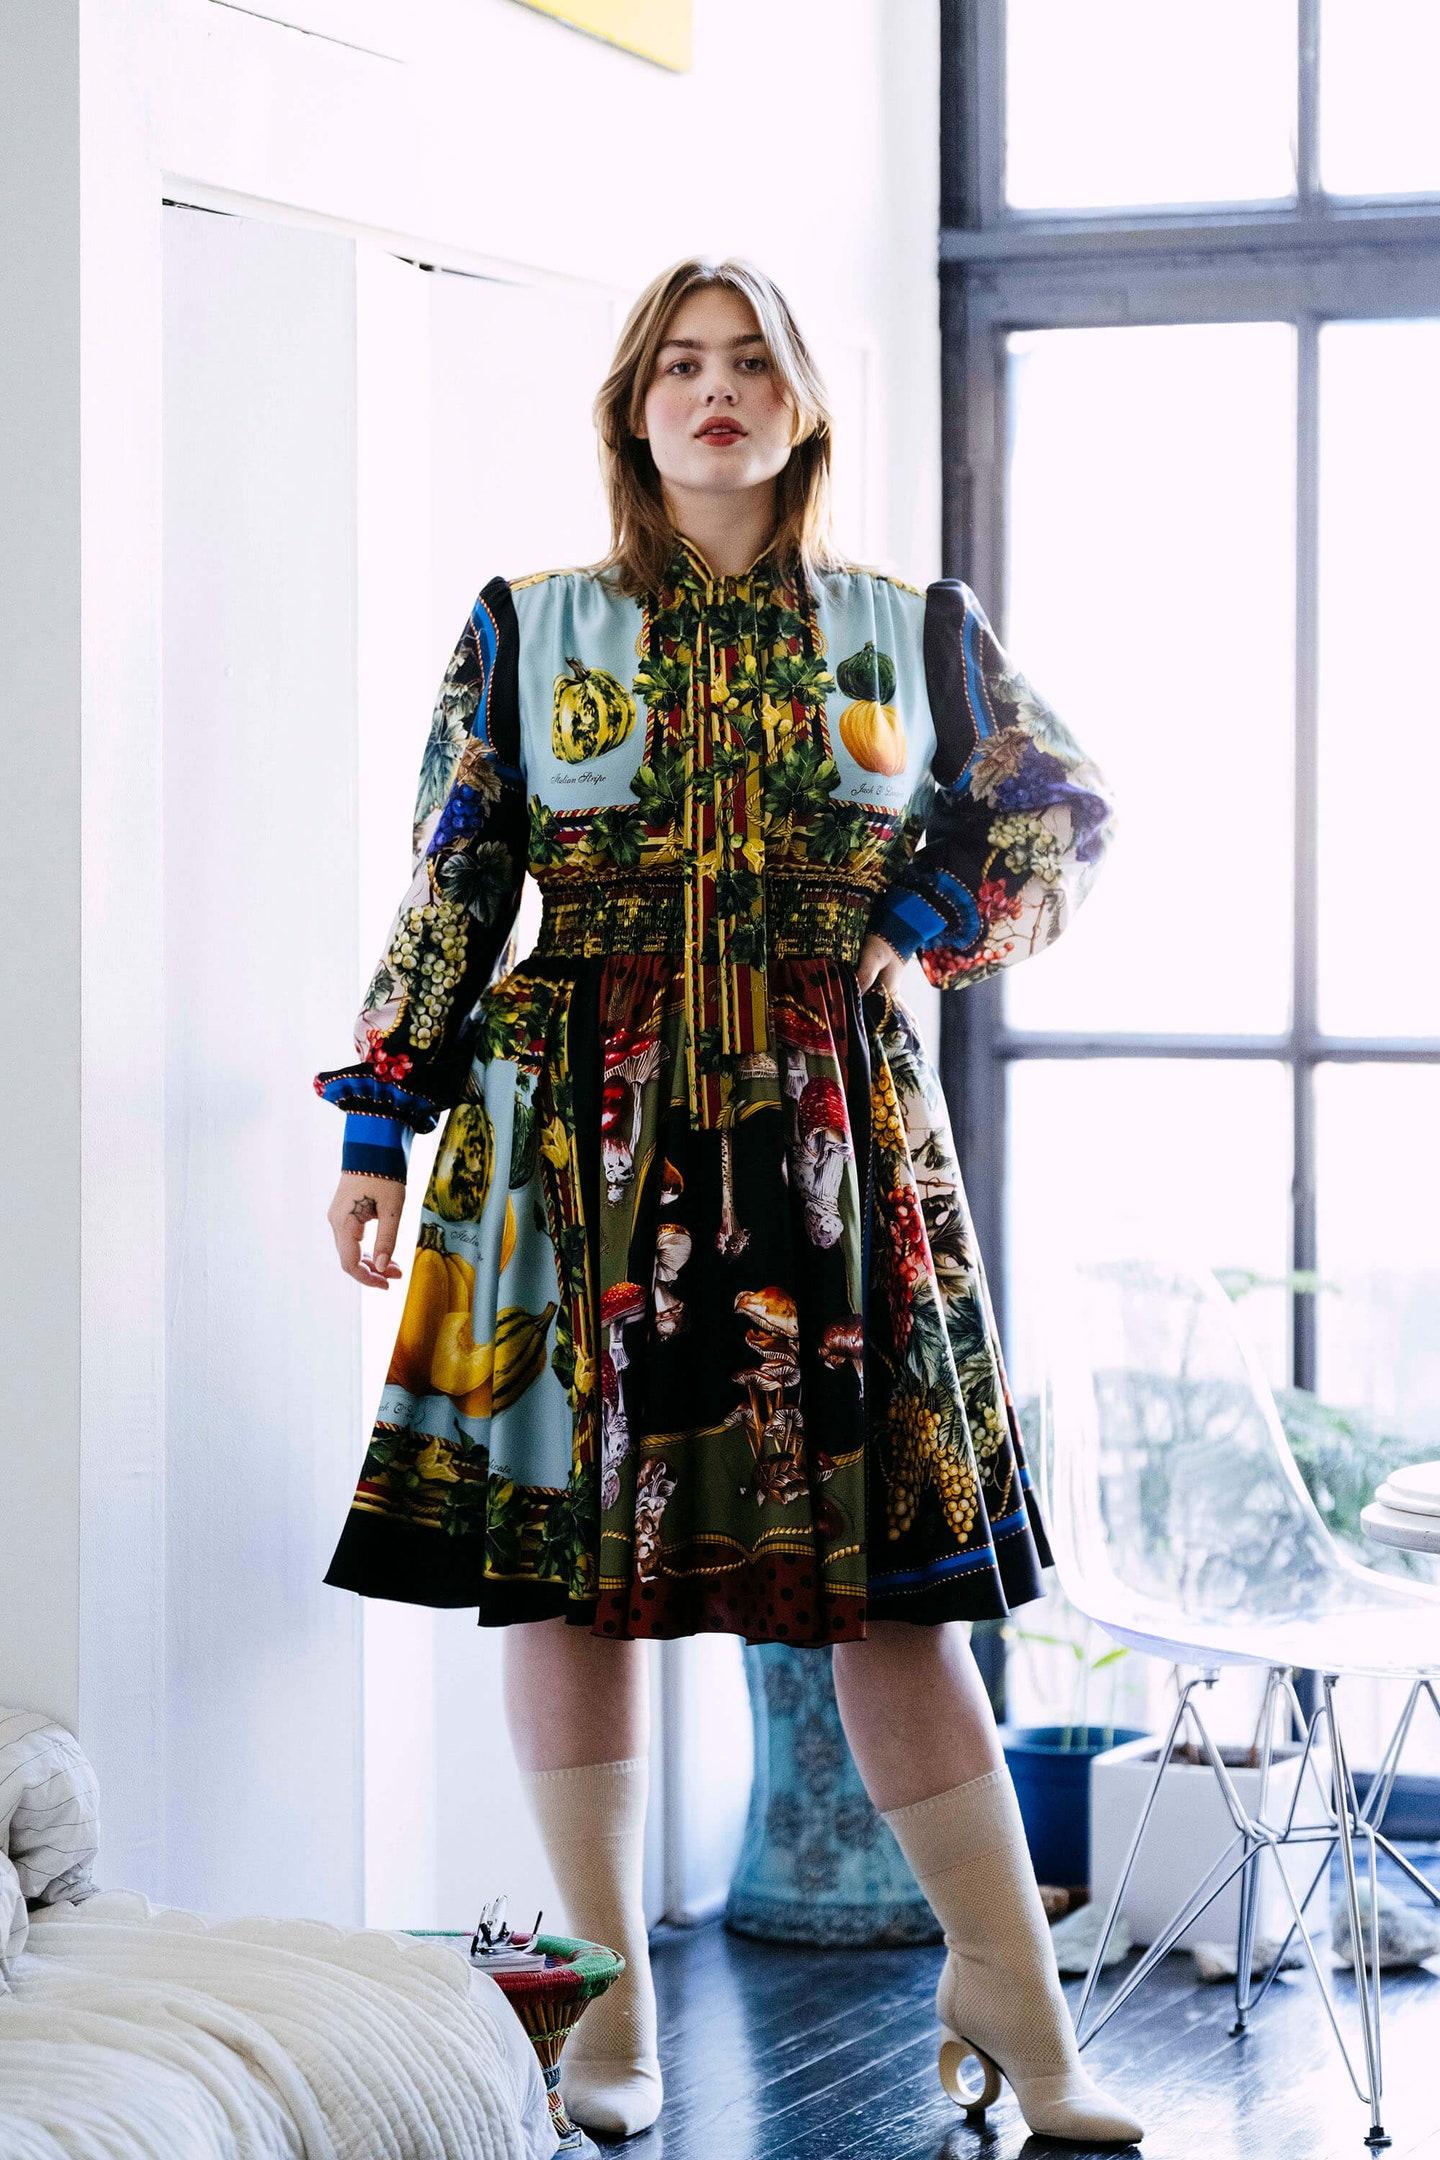 Dolce & Gabbana and Donatella Versace talk plus-size fashion